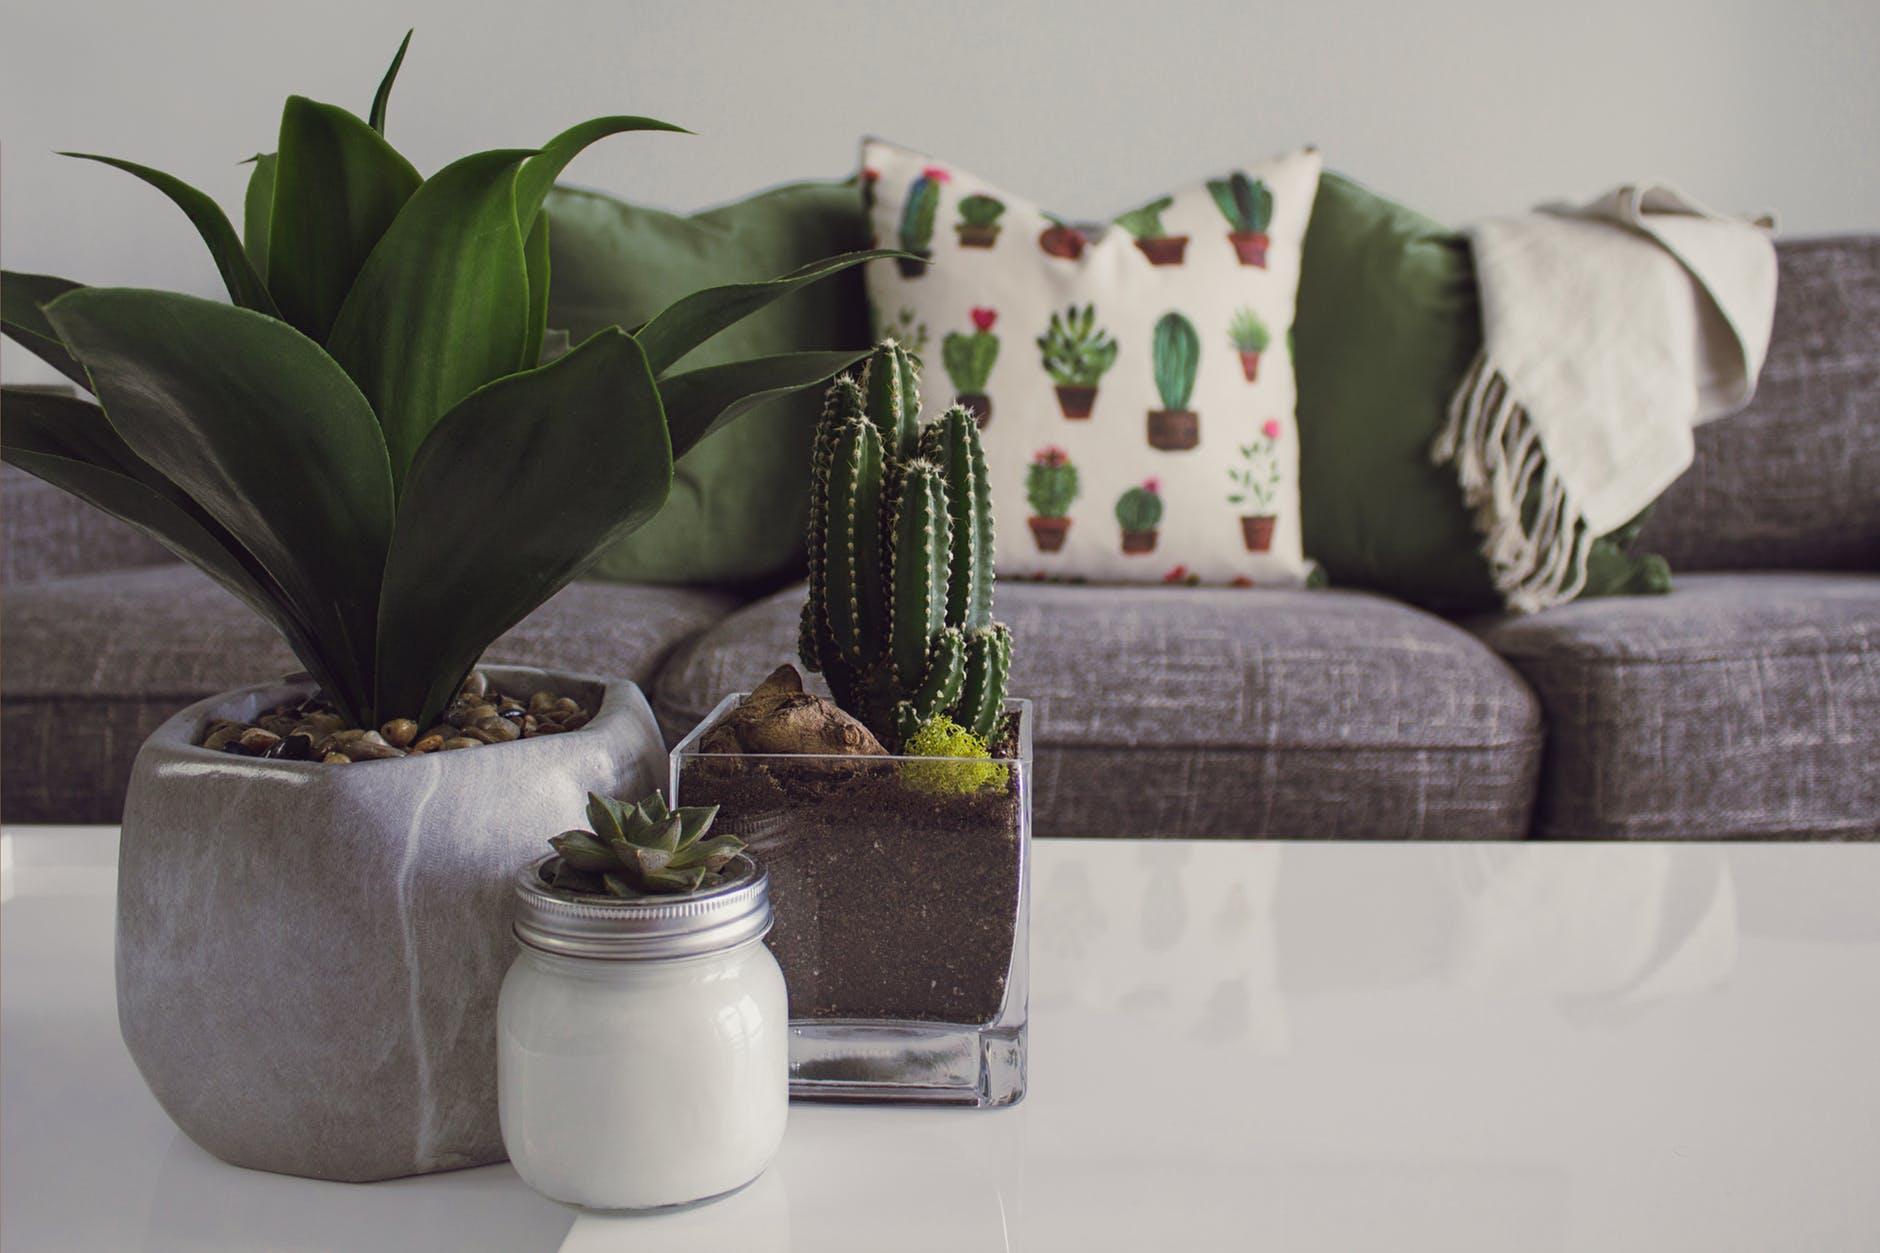 pexels photo 1005058 Top 10 Living Room Design